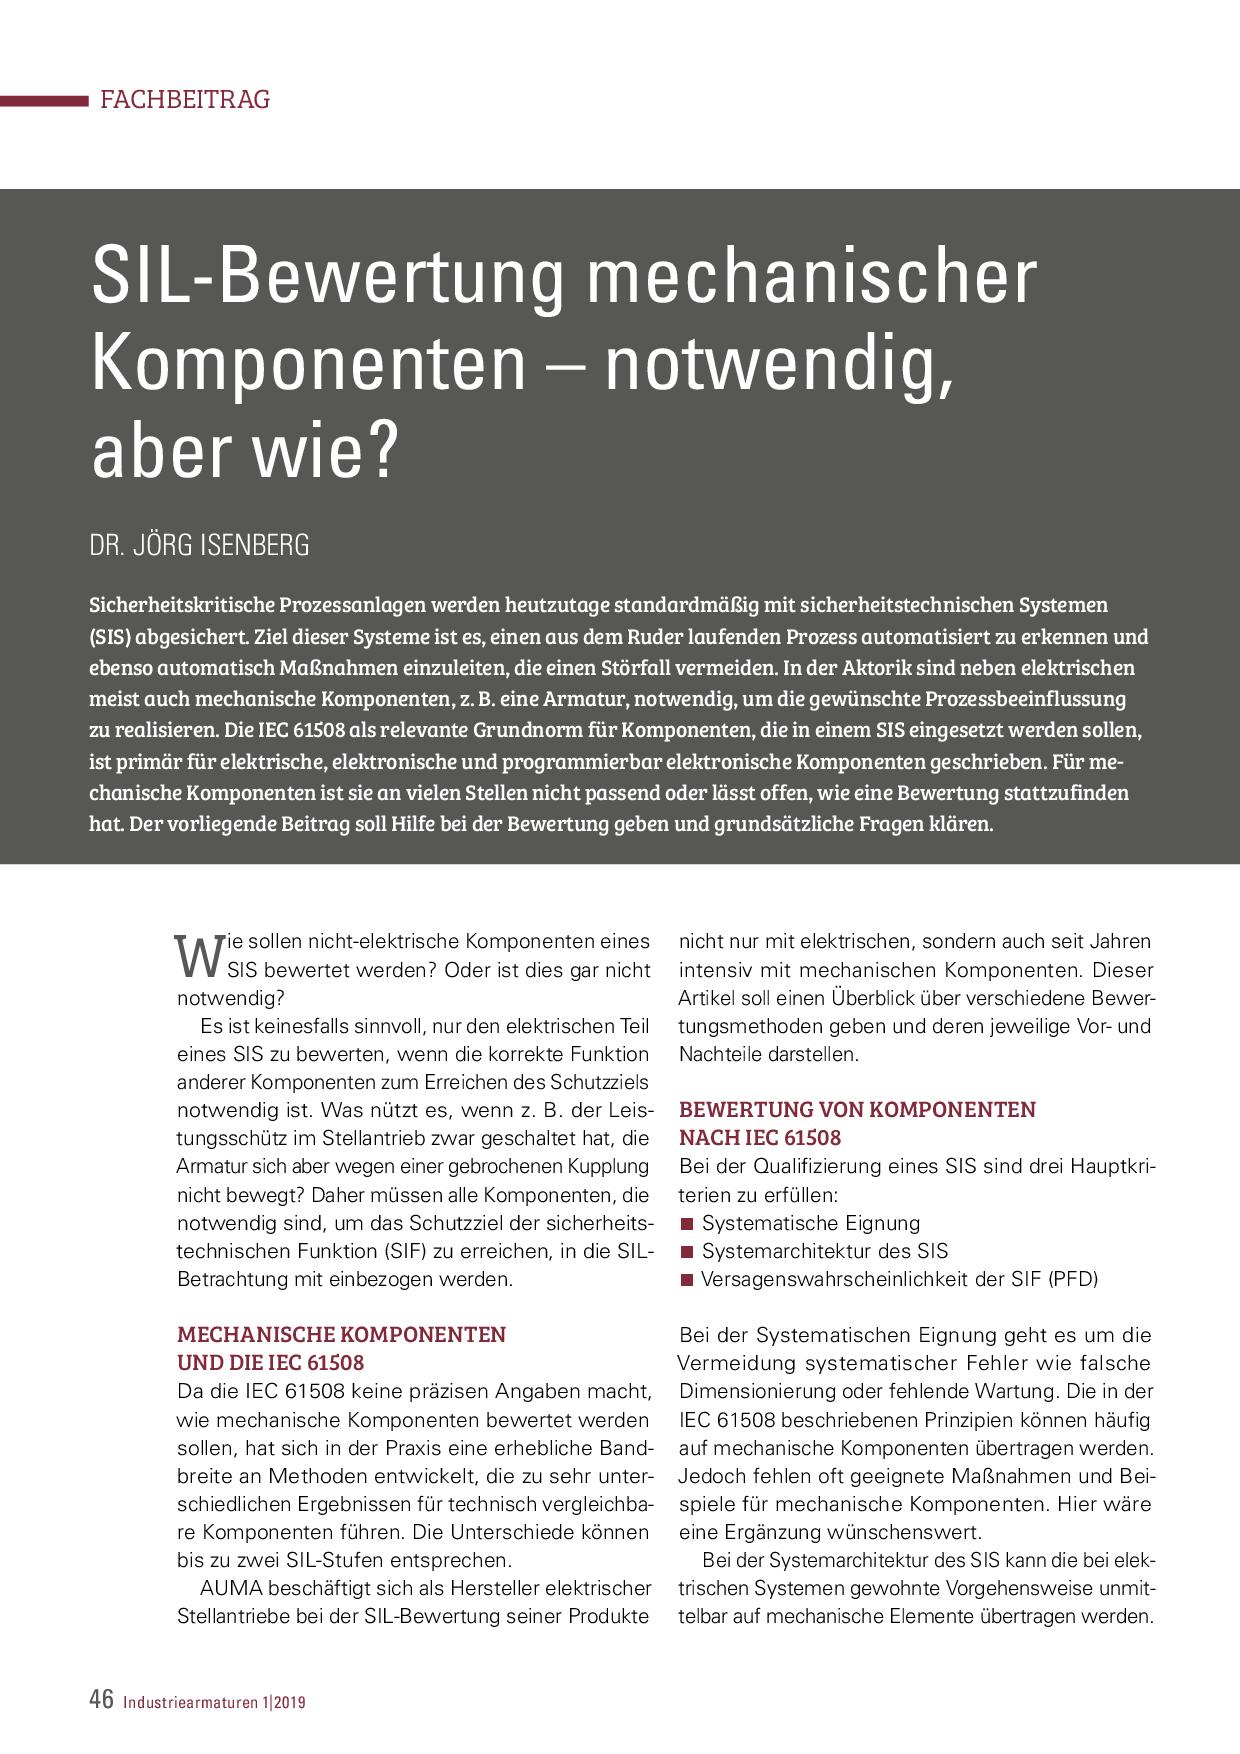 SIL-Bewertung mechanischer Komponenten – notwendig, aber wie?